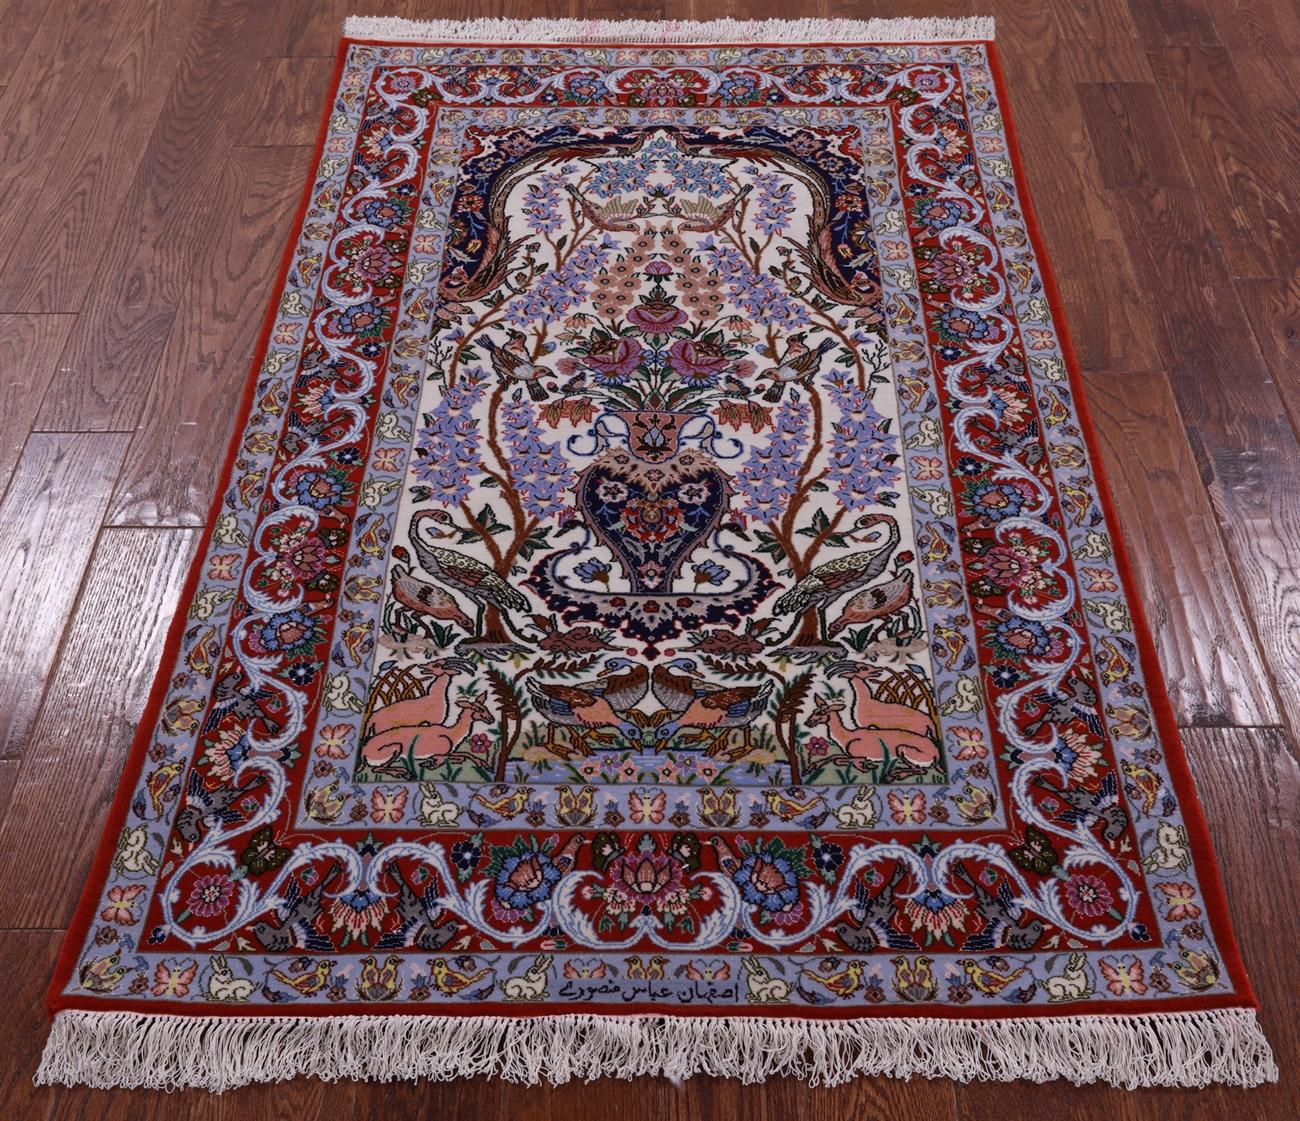 4 X 5 Signed Persian Isfahan Handmade Wool Silk Rug